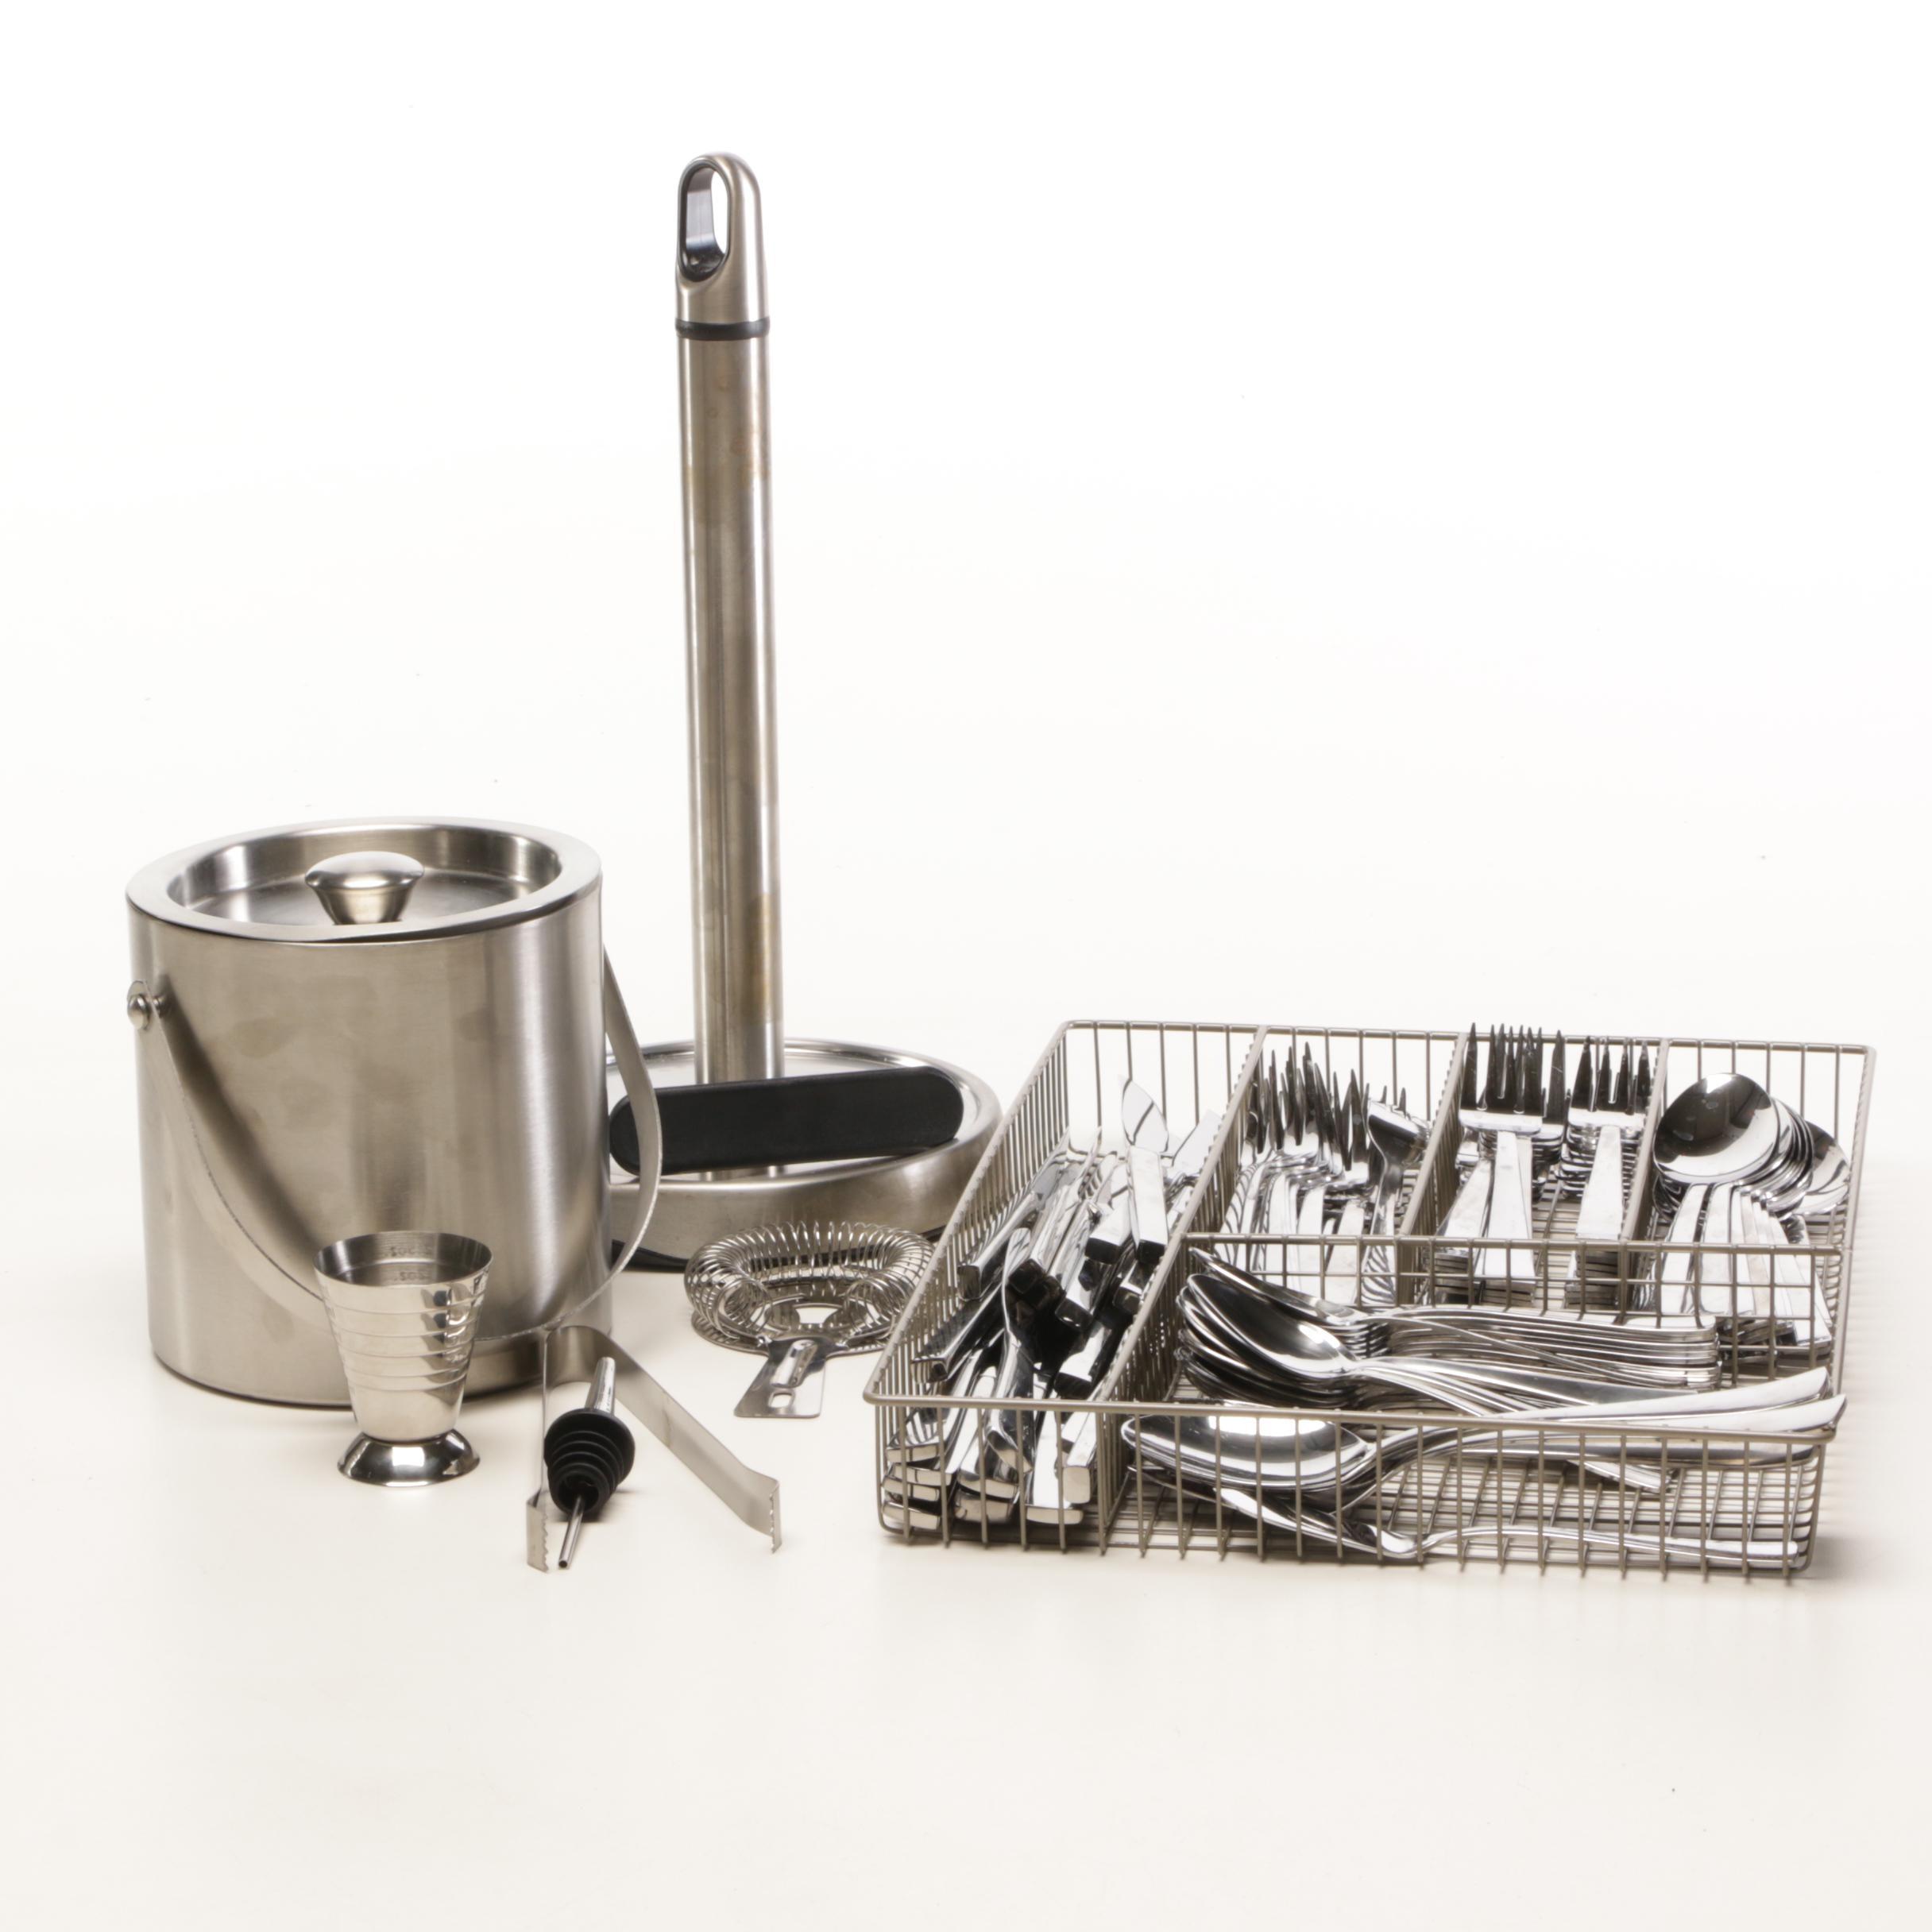 Oneida Flatware and Serveware Including Wusthof Steak Knives